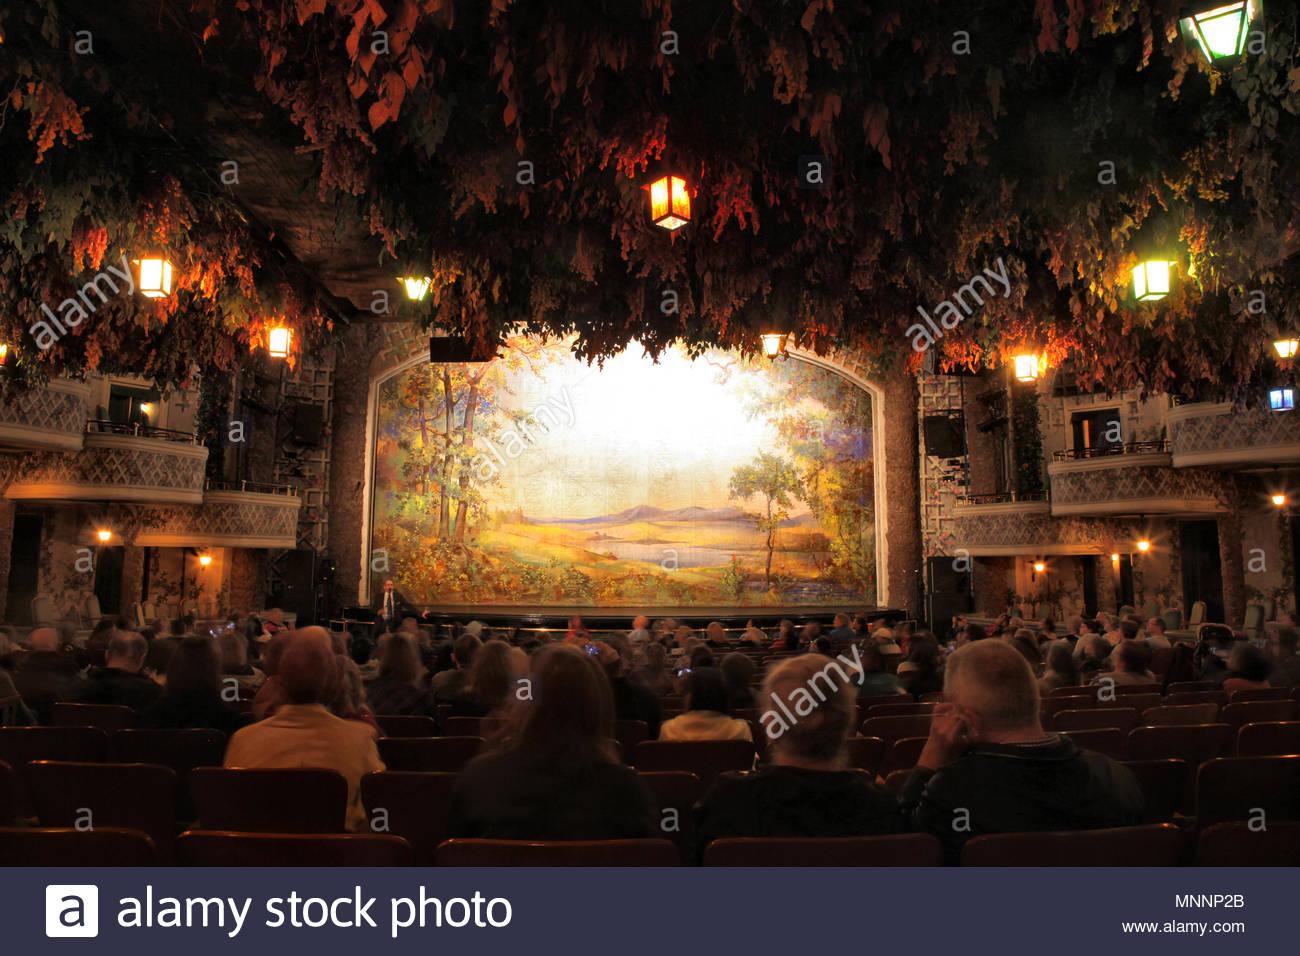 Vaudeville Theatre America Stock Photos & Vaudeville Theatre America ...